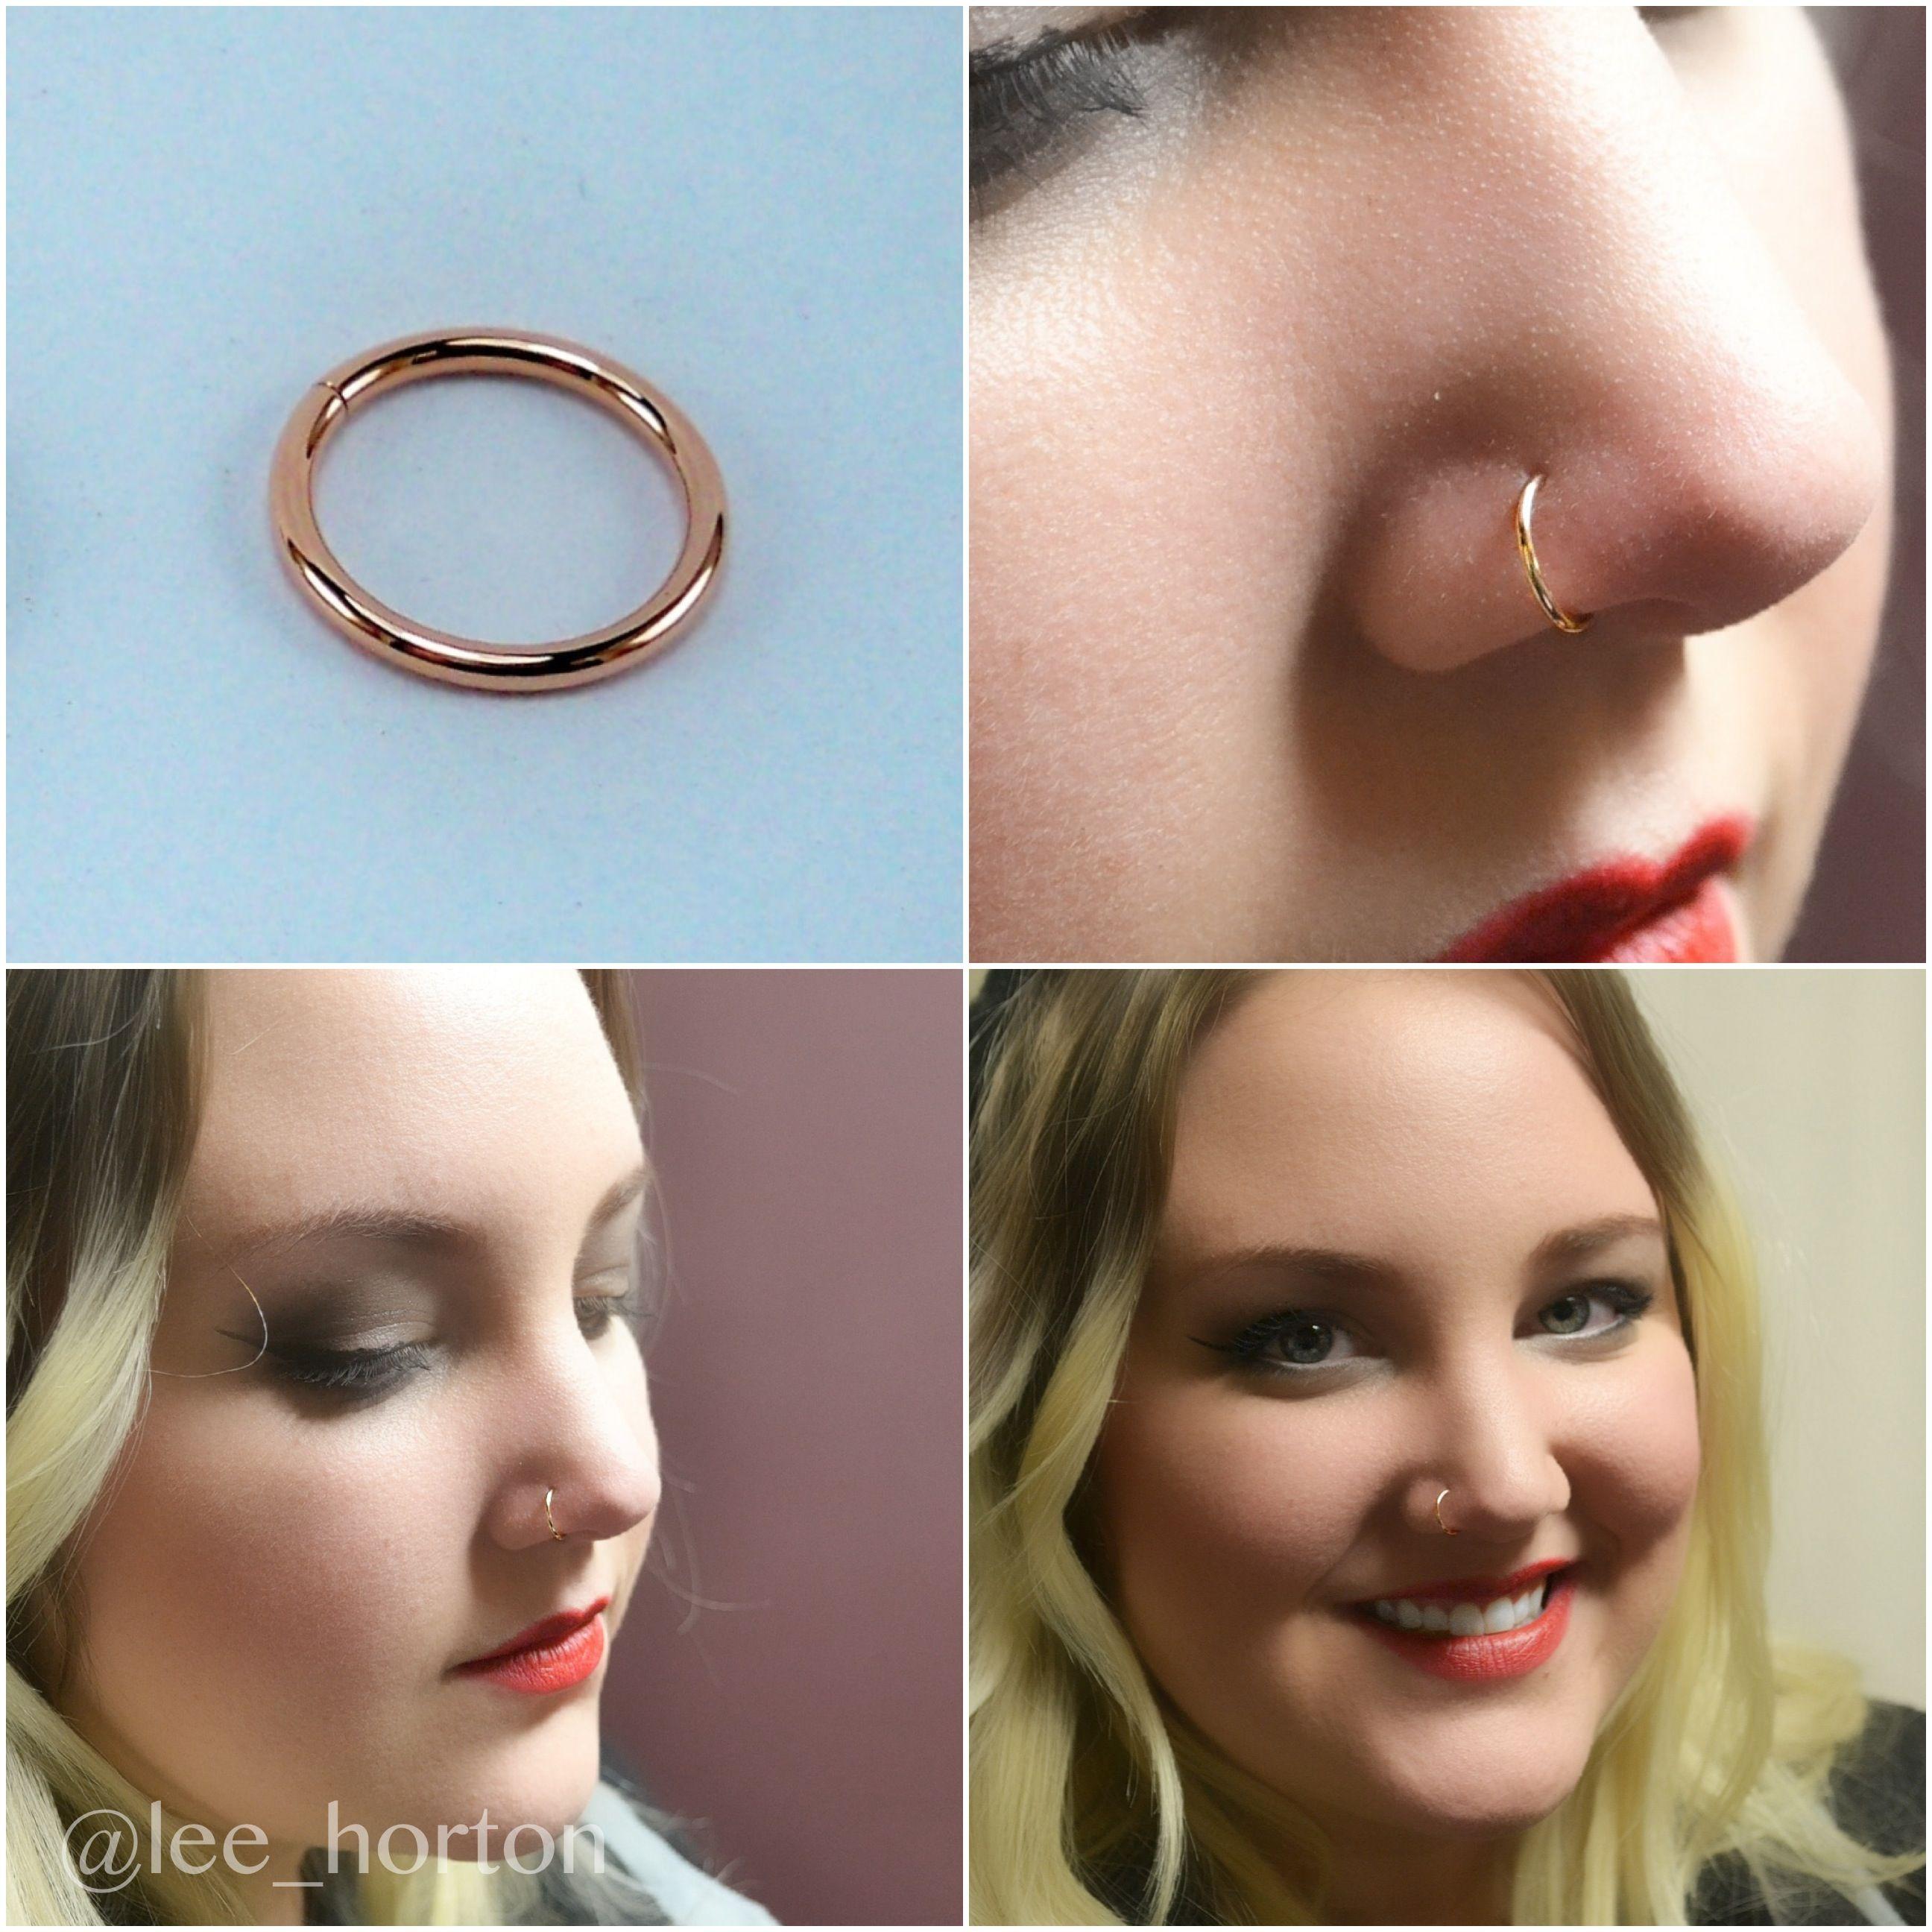 Gold nose piercing  Lee Horton leehorton on Pinterest